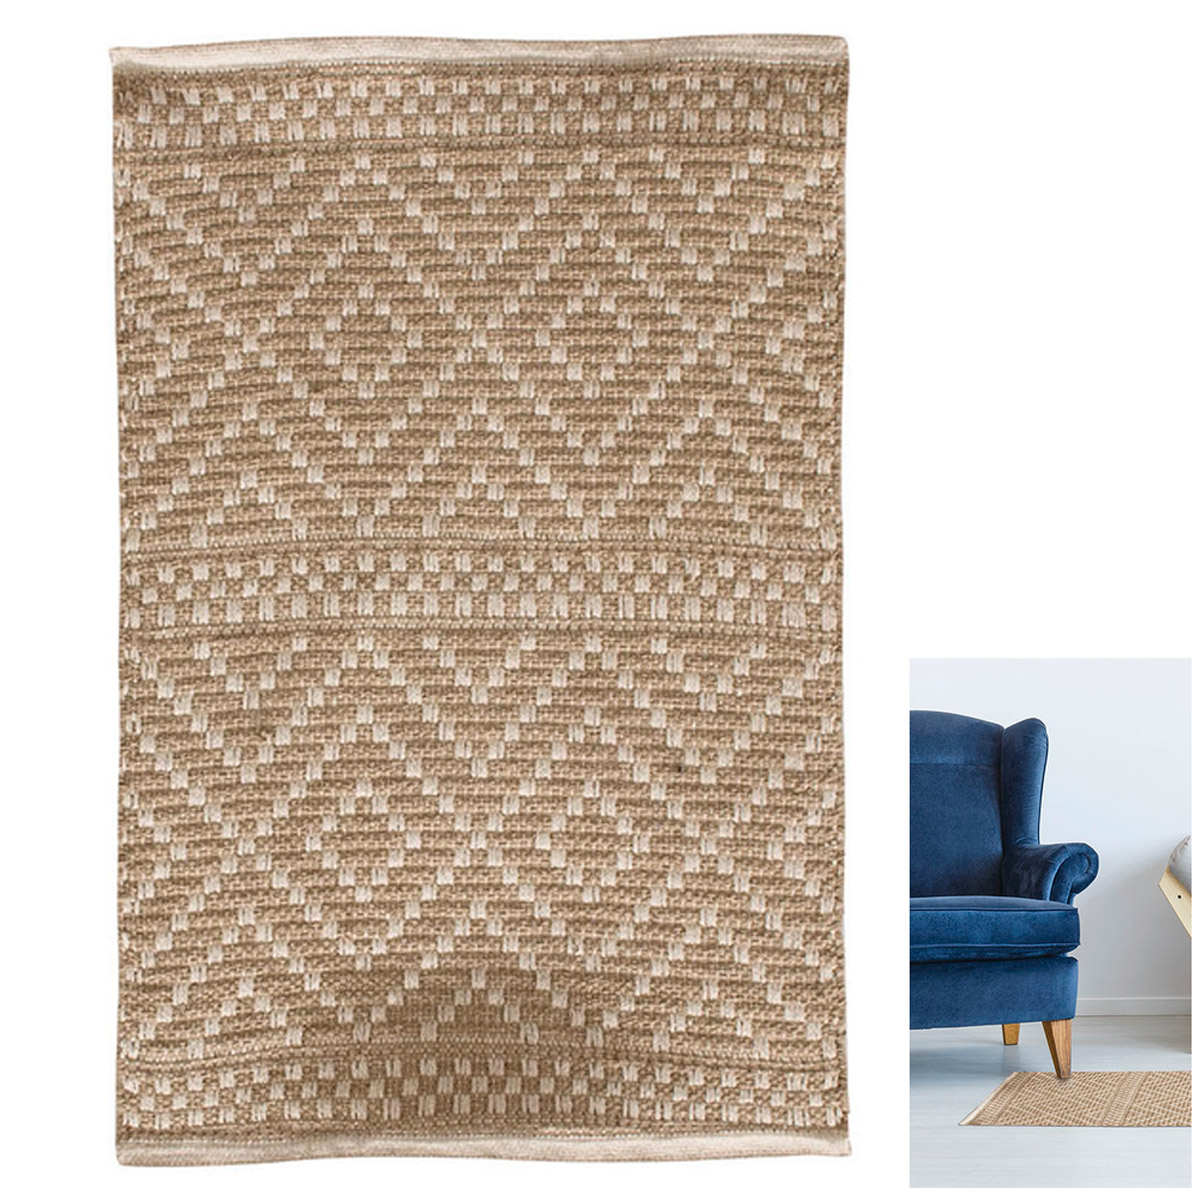 Tapis coton \'Boho\' beige - 80x60 cm - [R2488]